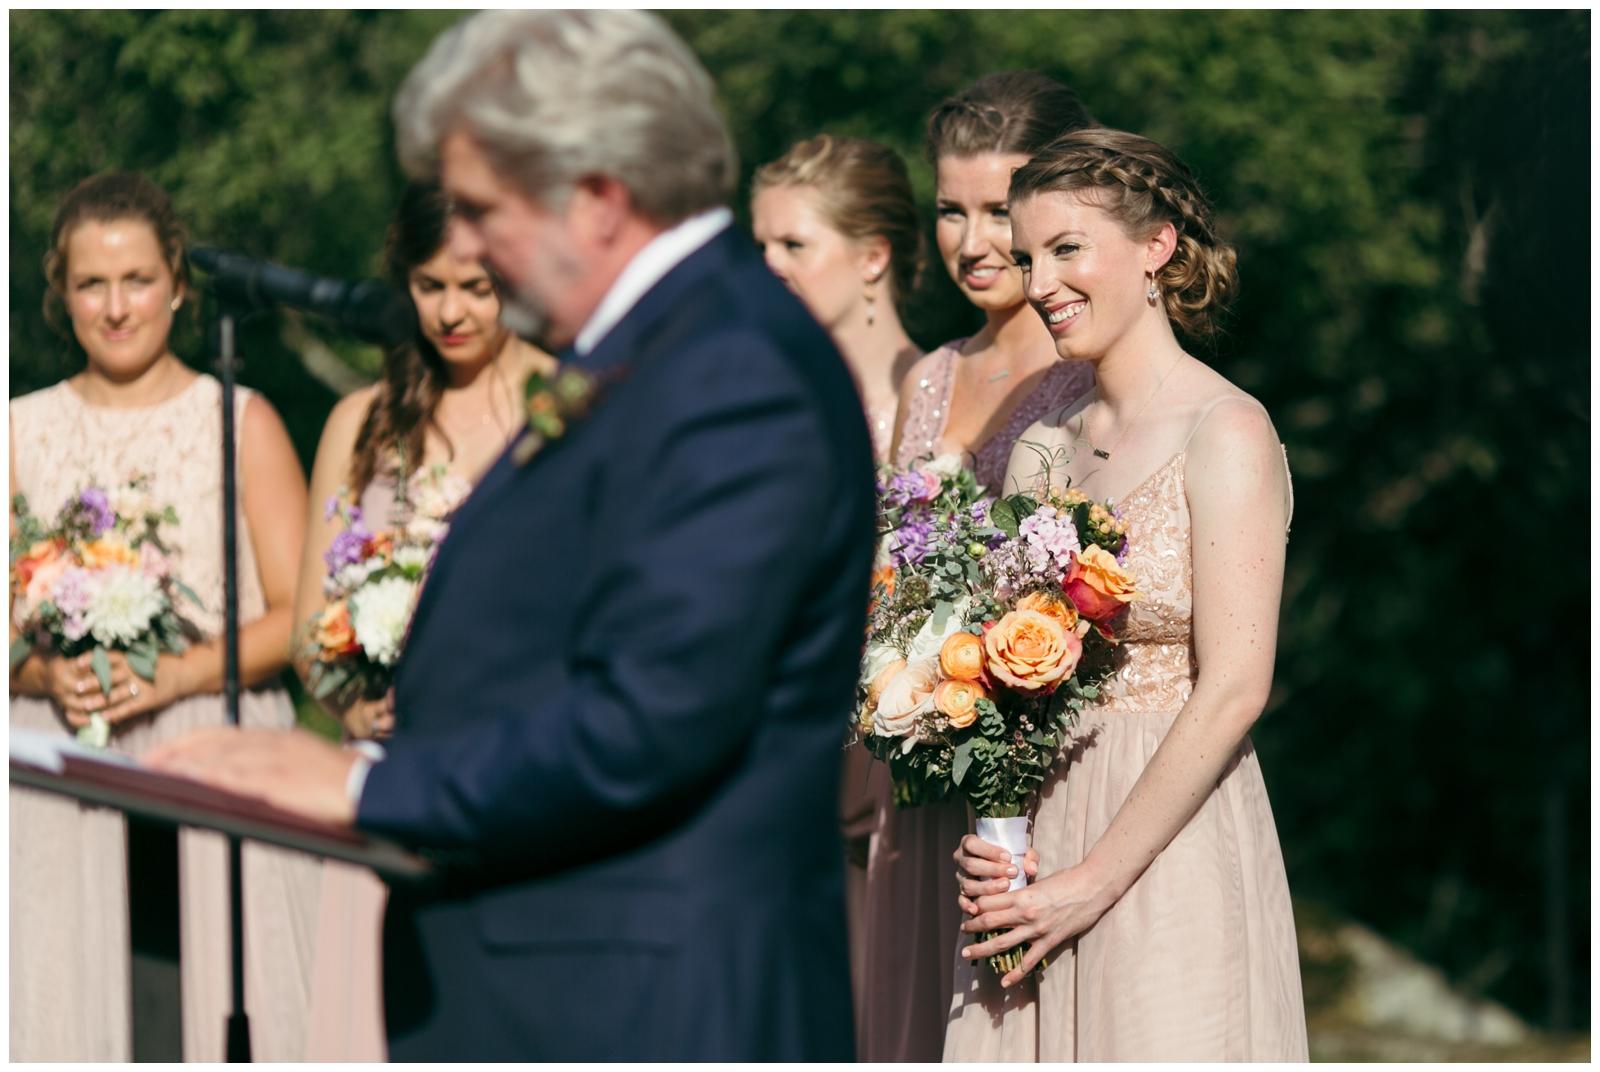 Moraine-Farm-wedding-Bailey-Q-Photo-Massachusetts-wedding-photpgrapher-072.jpg